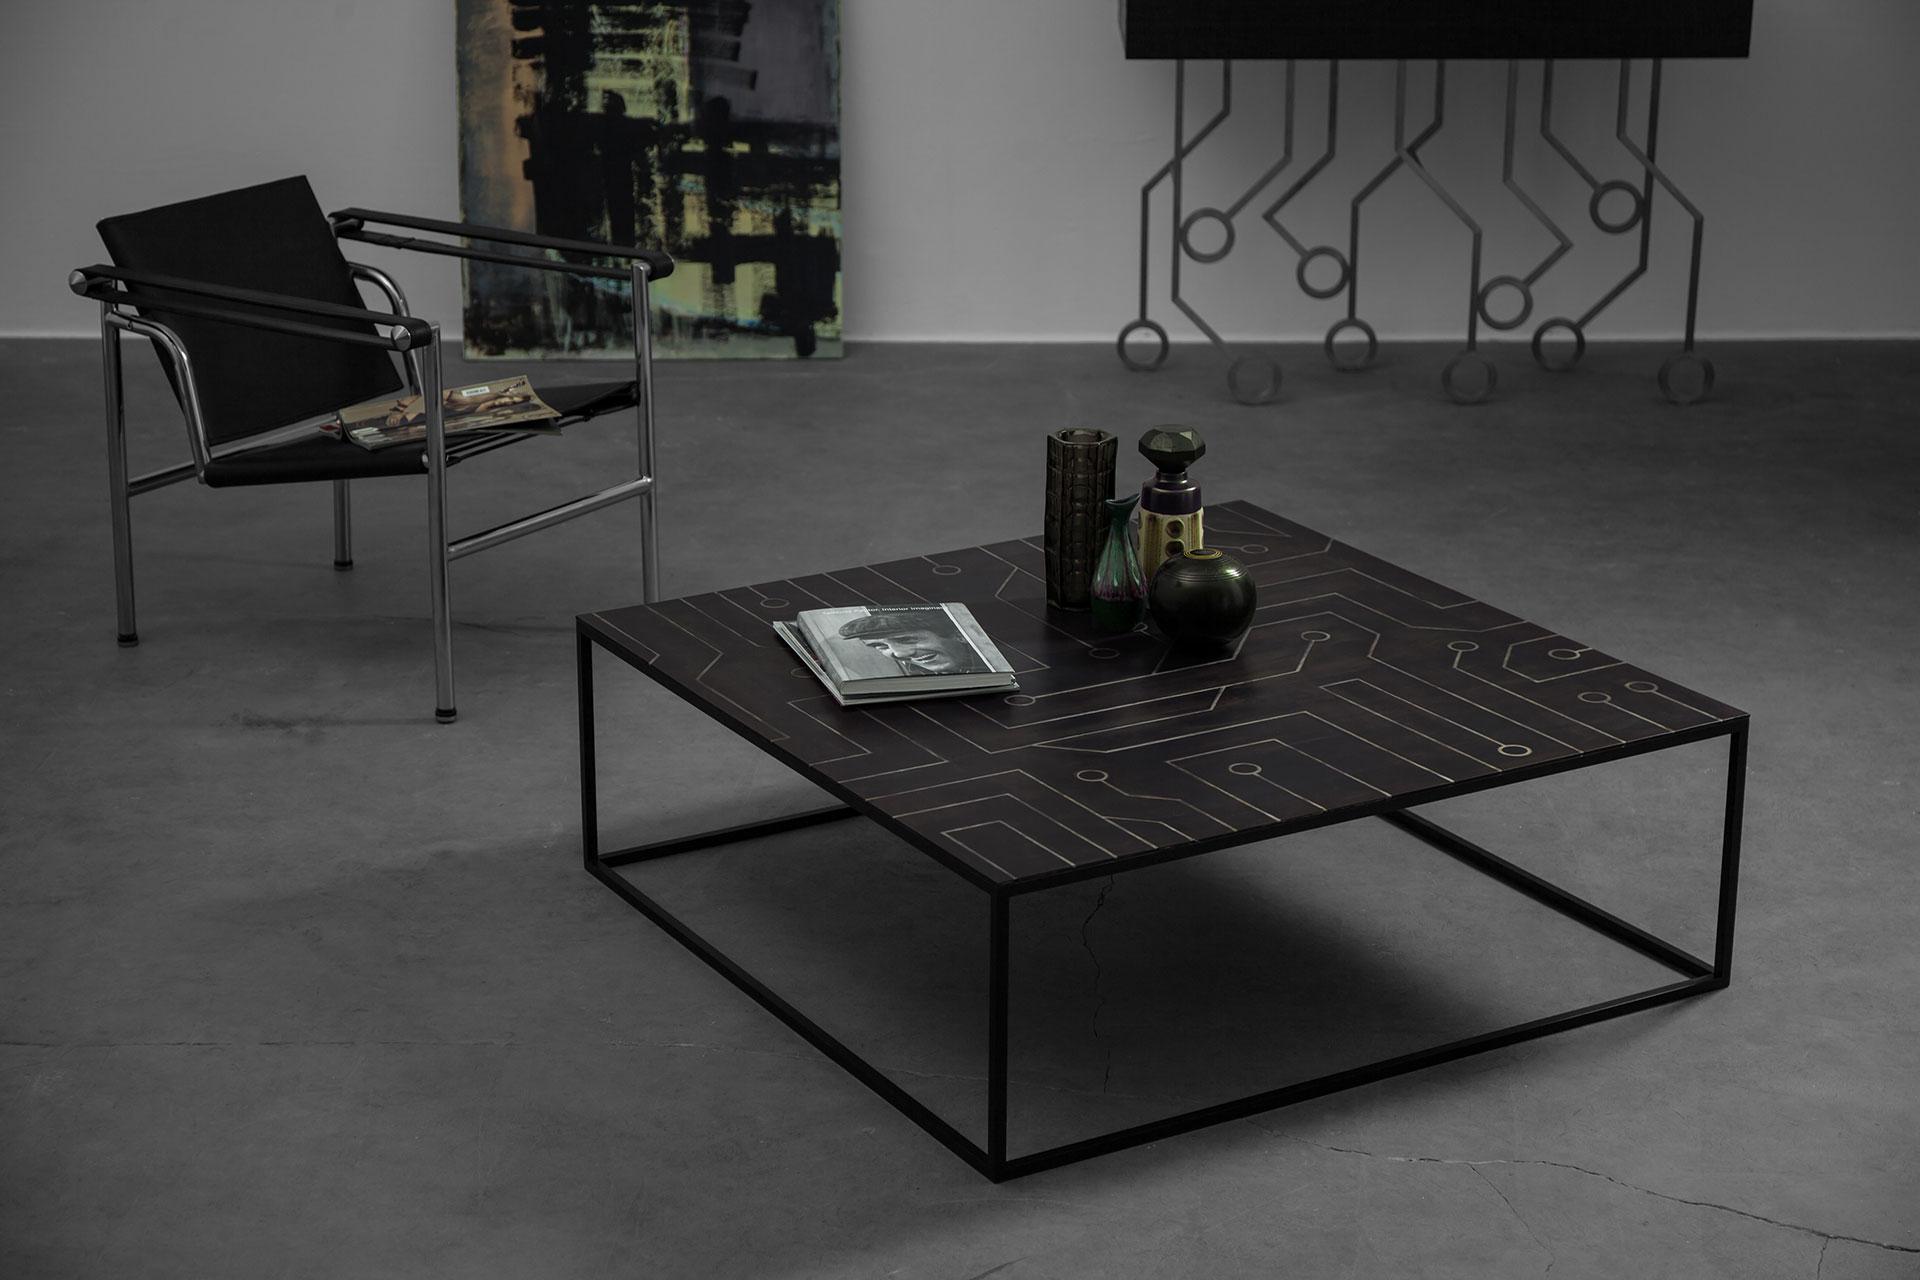 Brutalist design large coffee table in minimalist apartment